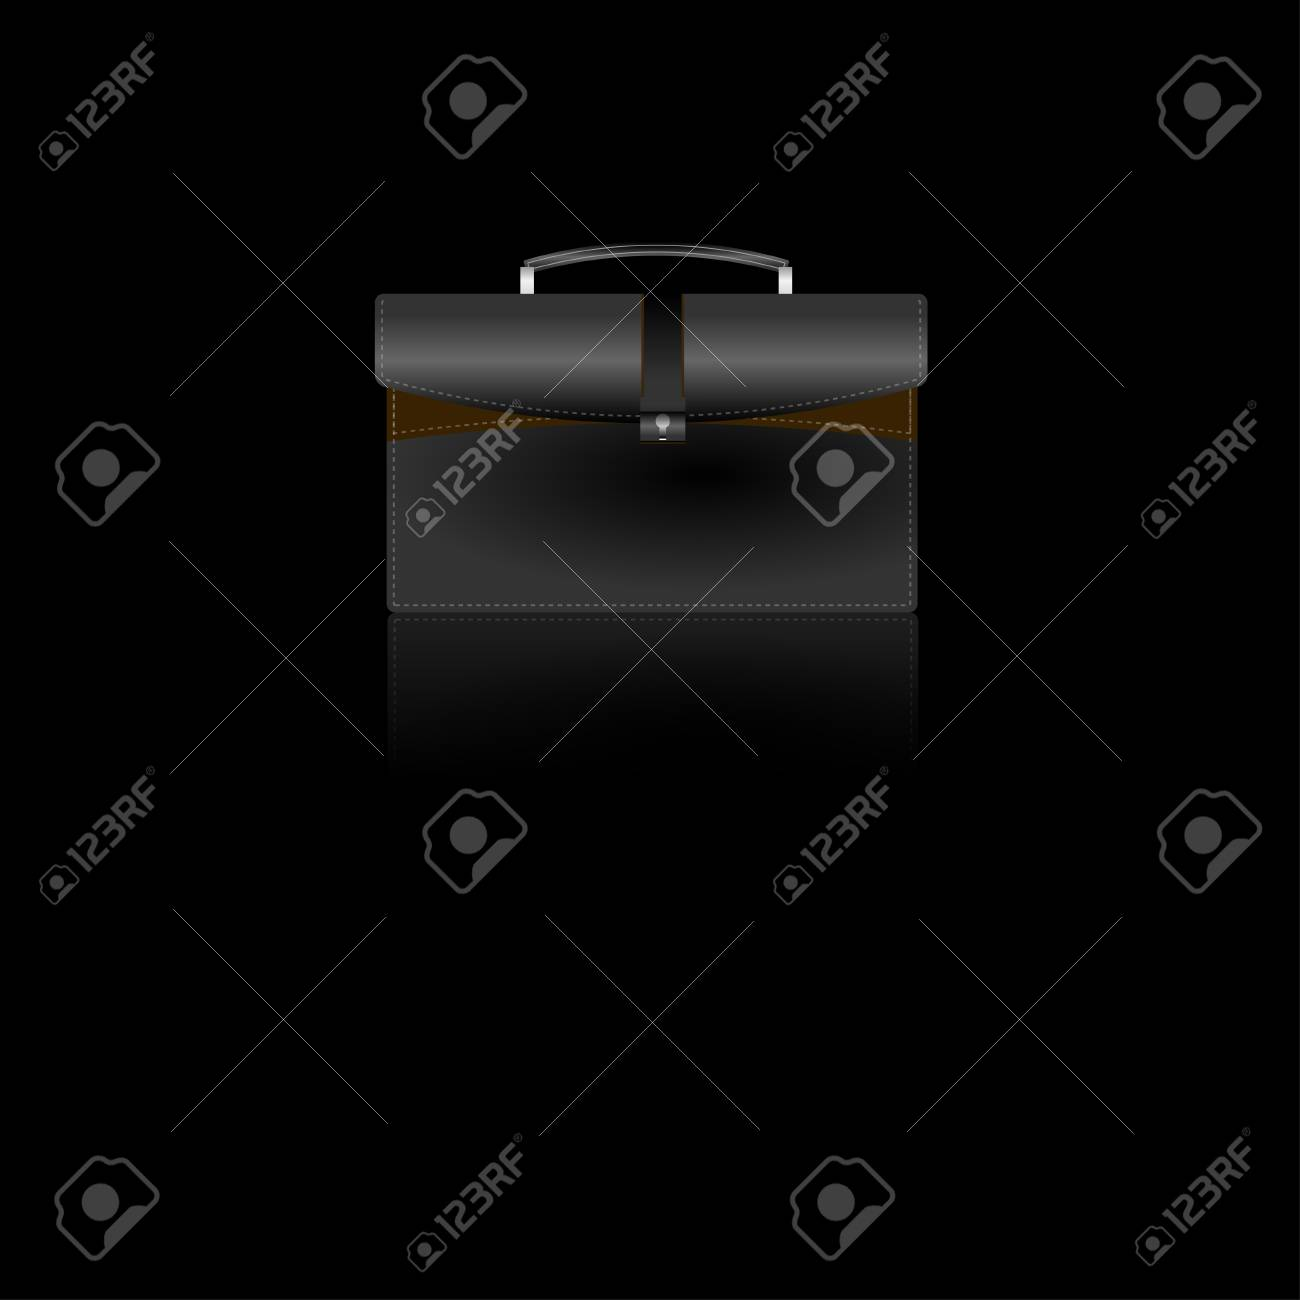 Tan & Black Briefcase Icon Stock Vector - 11561041